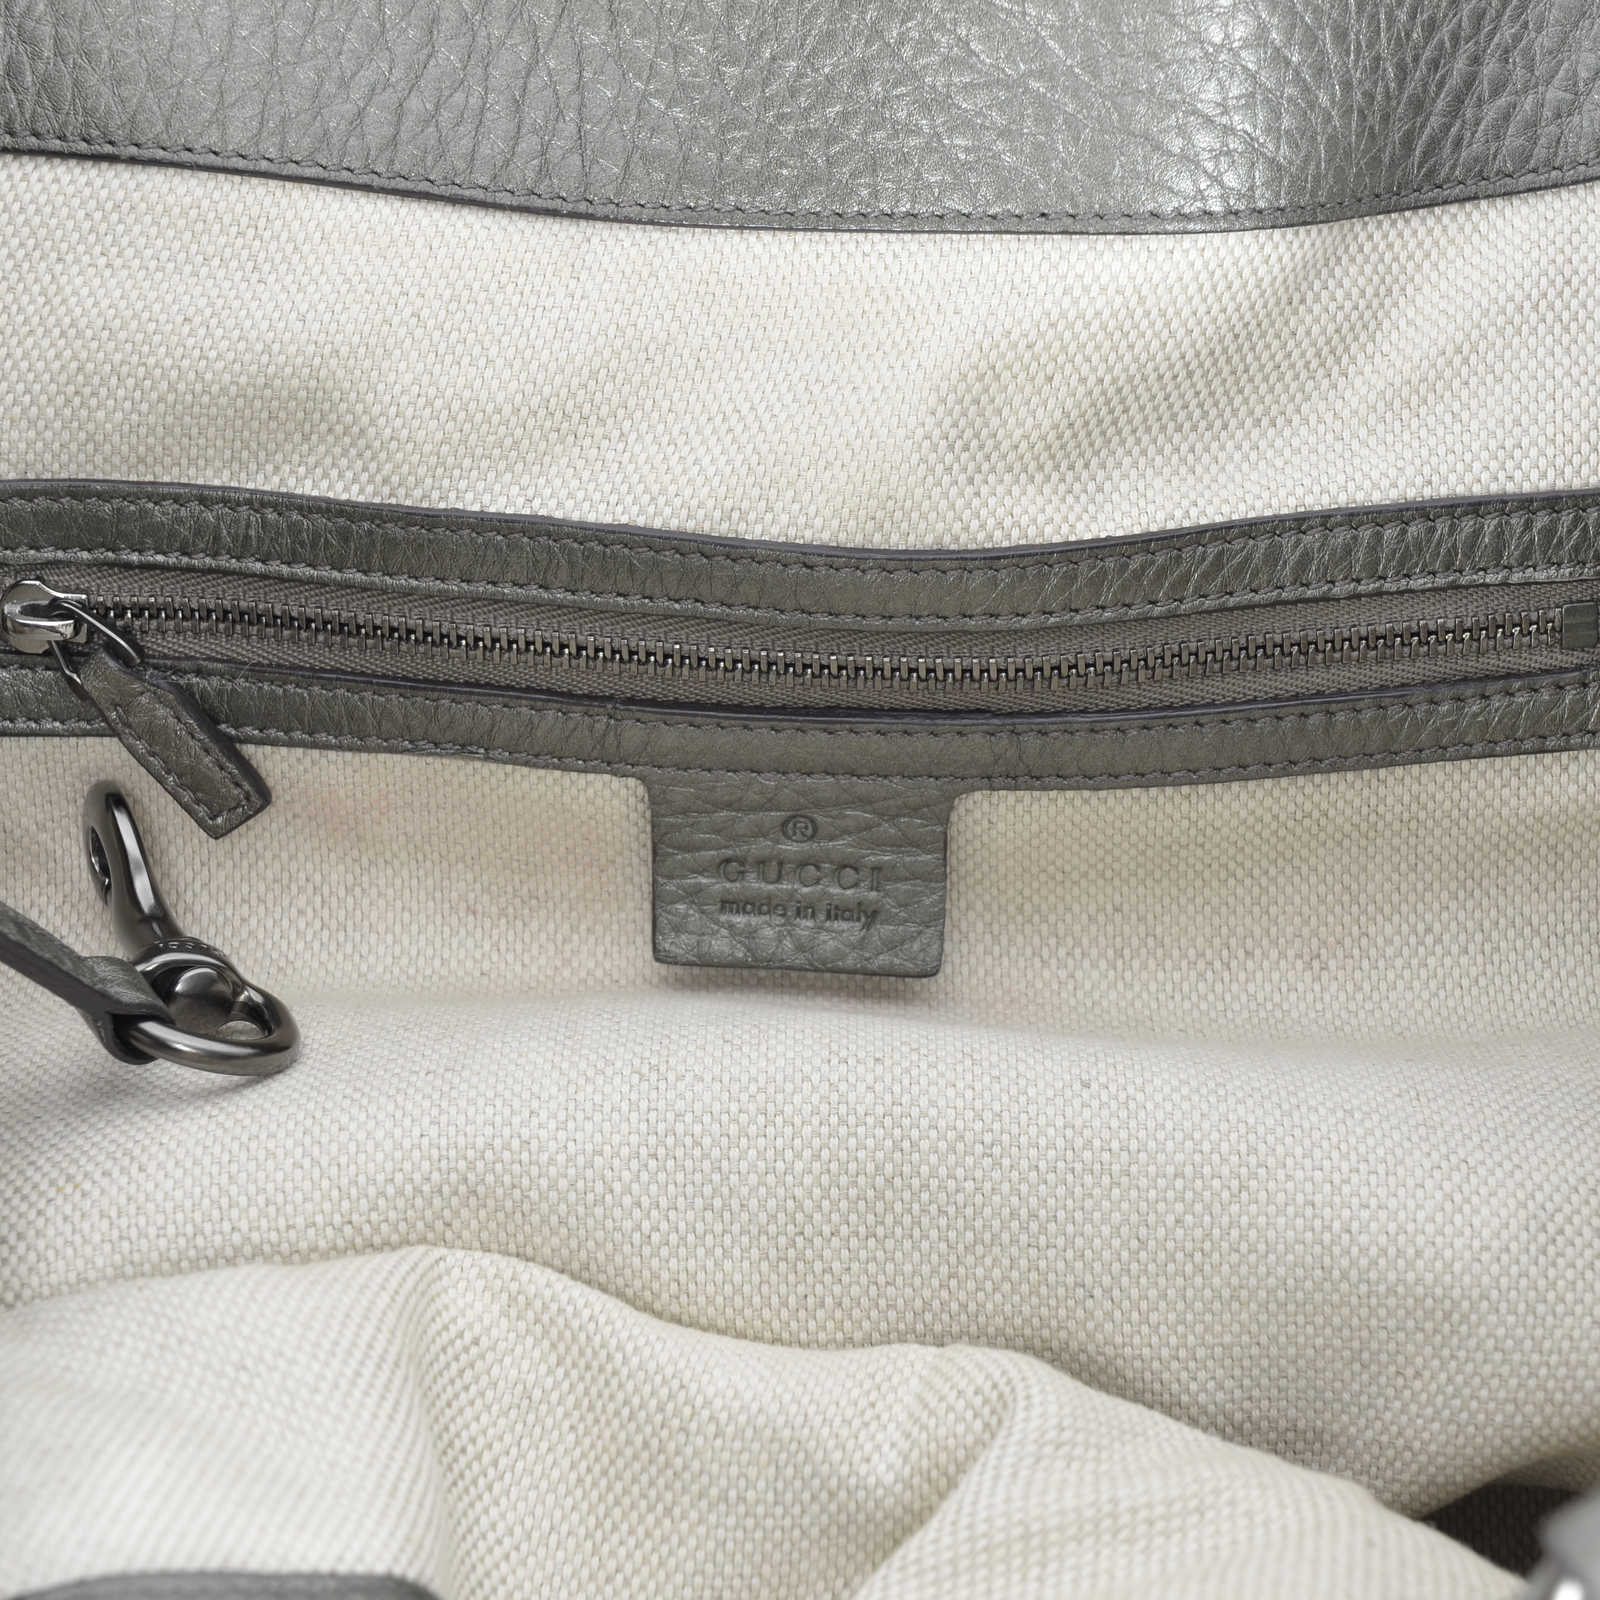 fed3b33a5fb ... Authentic Second Hand Gucci Medium Soho Shoulder Bag (PSS-021-00011) -